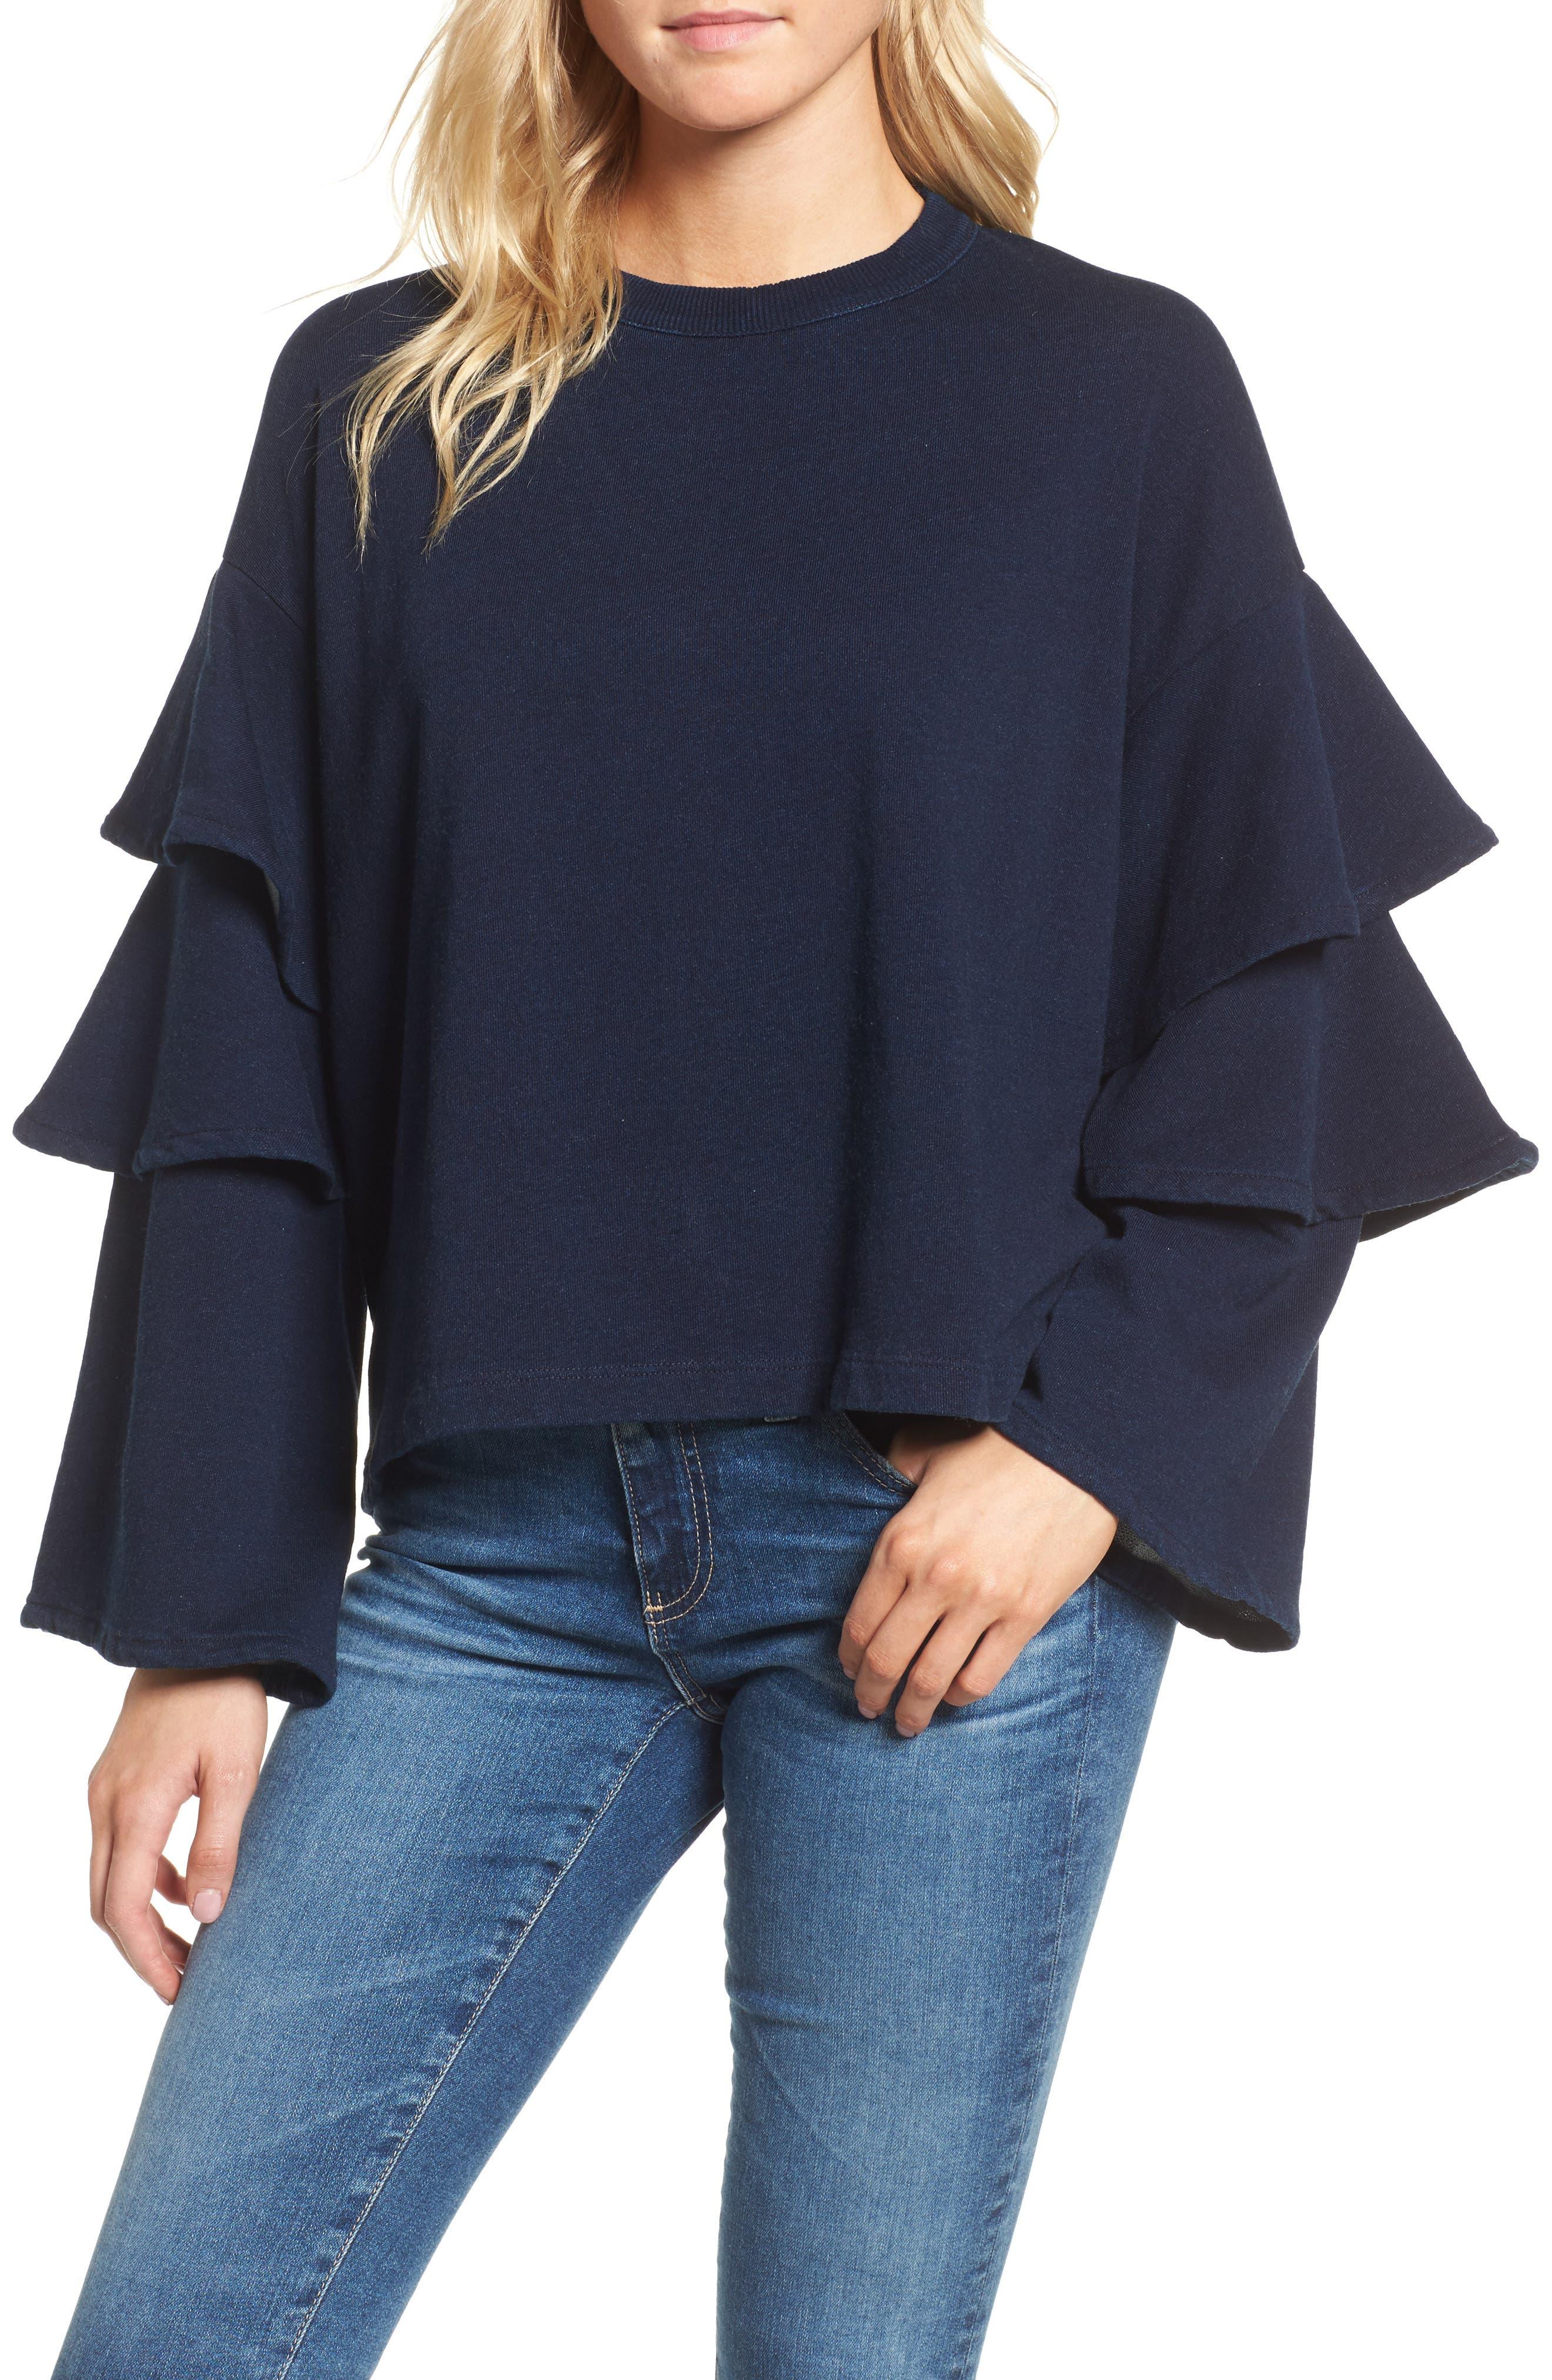 Main Image - AG Pearl Ruffle Sweatshirt